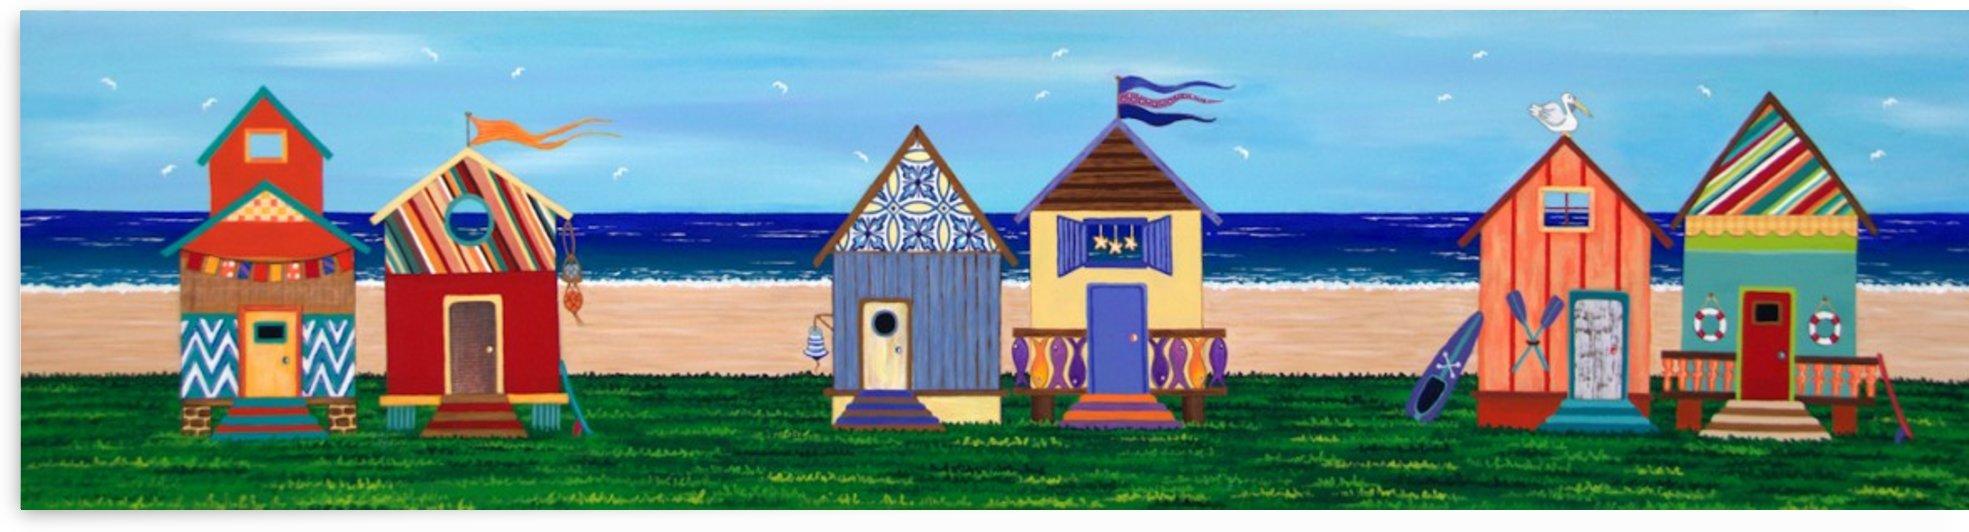 Beach House Holiday by Lisa Frances Judd